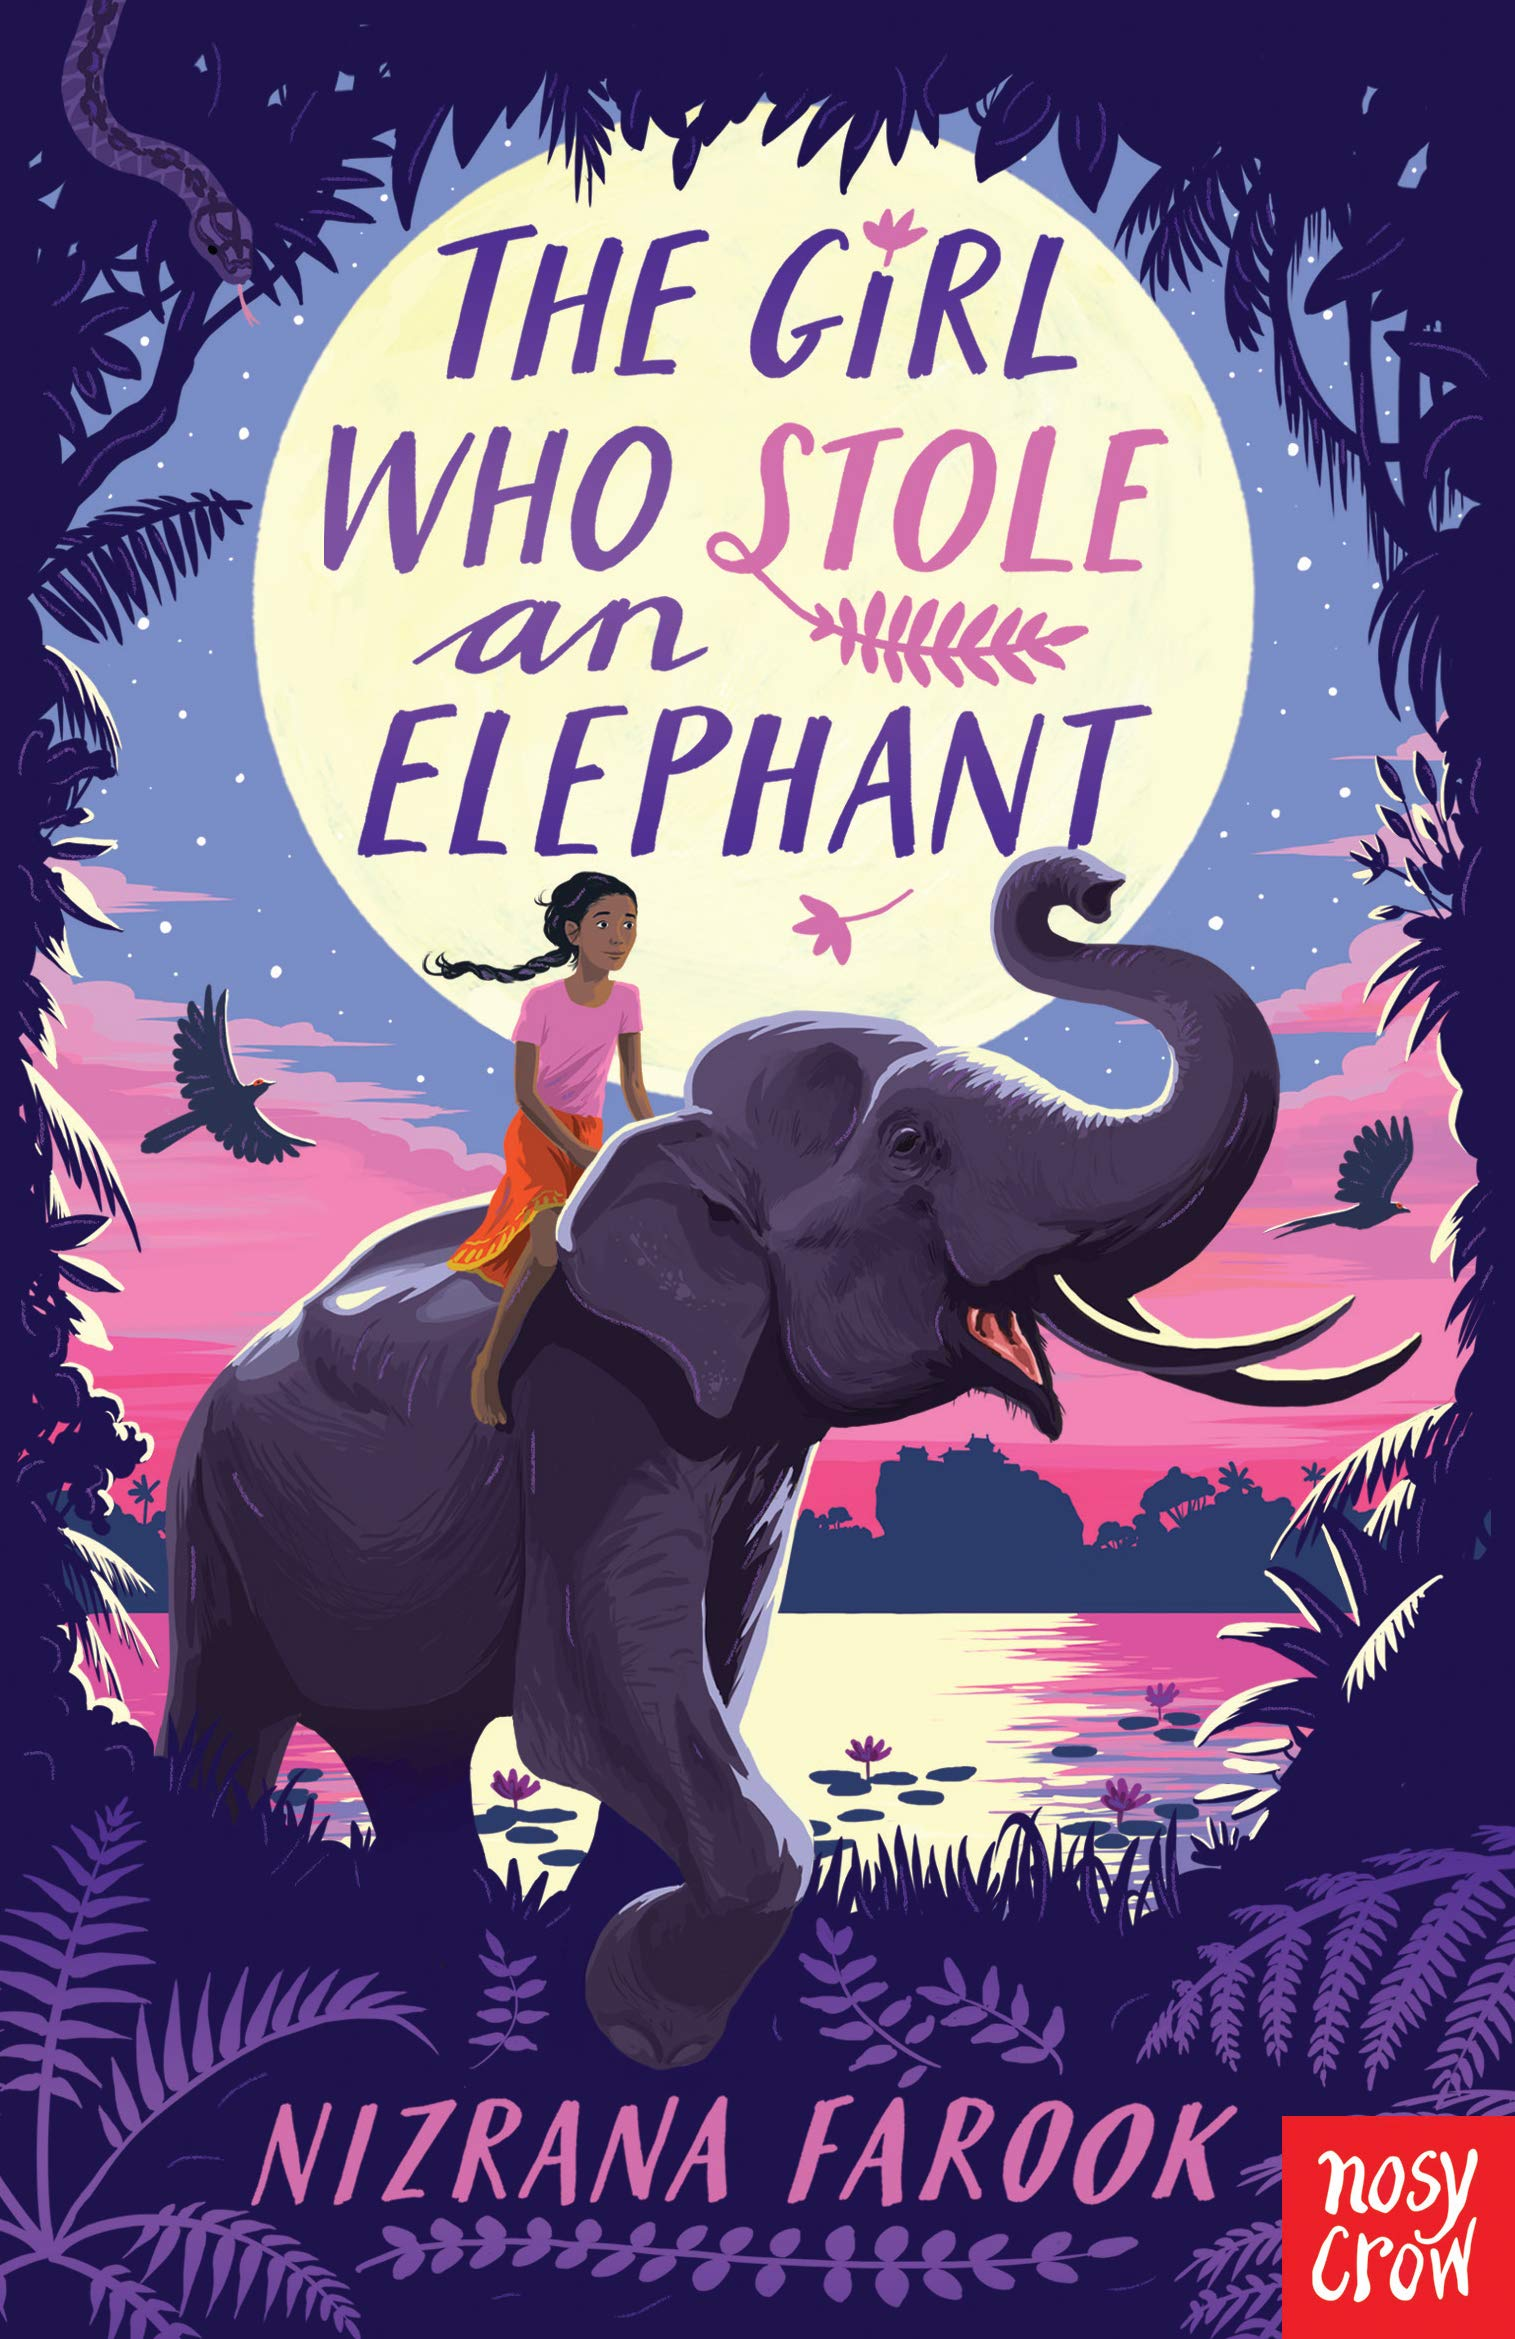 The Girl Who Stole an Elephant: Amazon.co.uk: Nizrana Farook ...